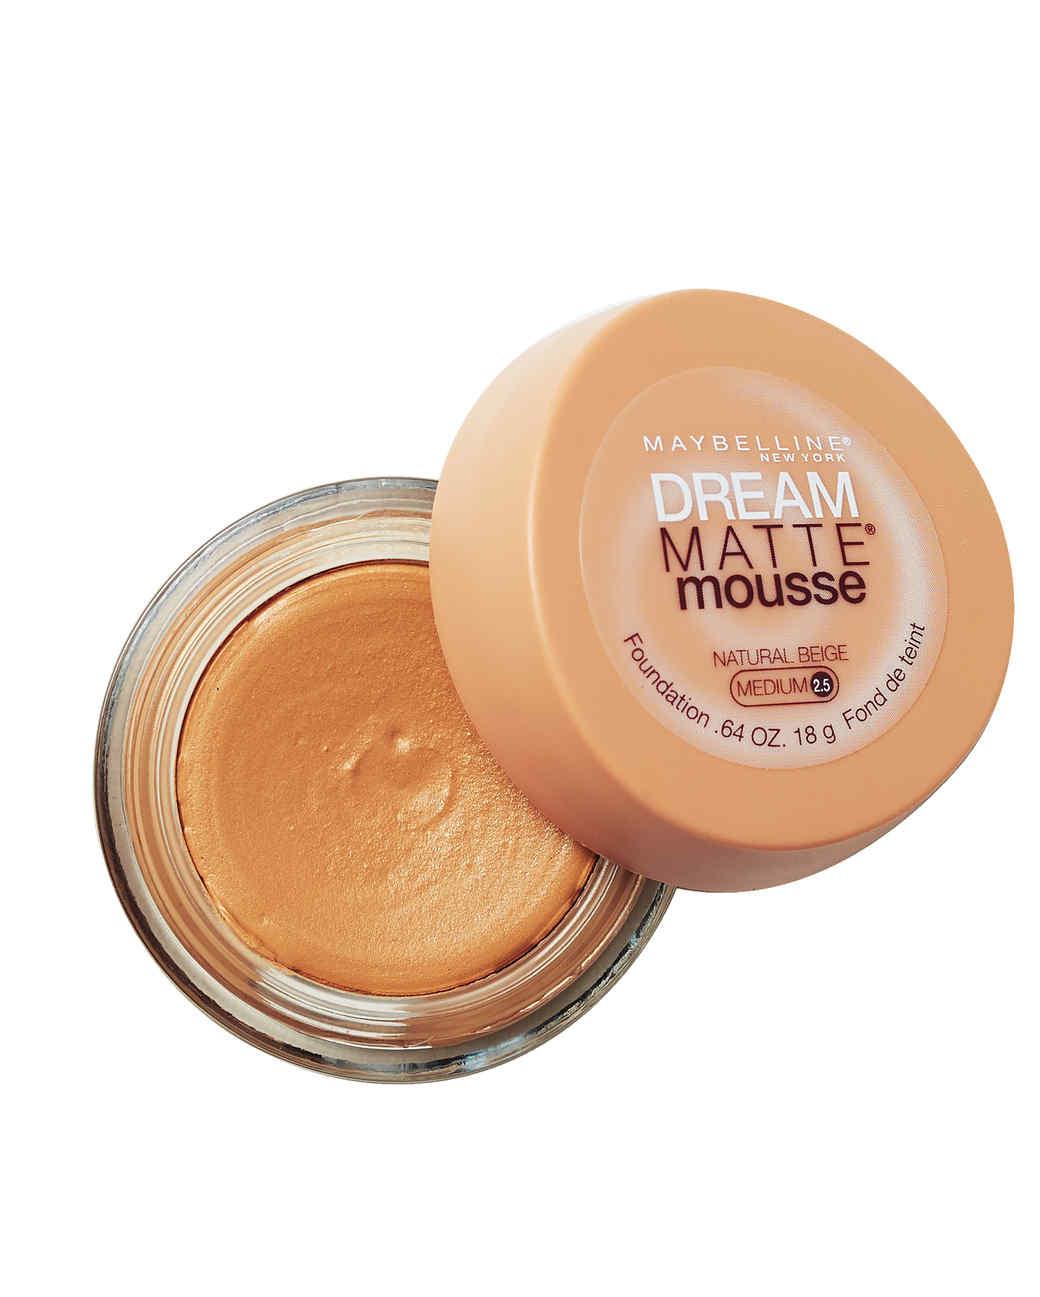 maybelline-dream-matte-mousse-188-d112219.jpg